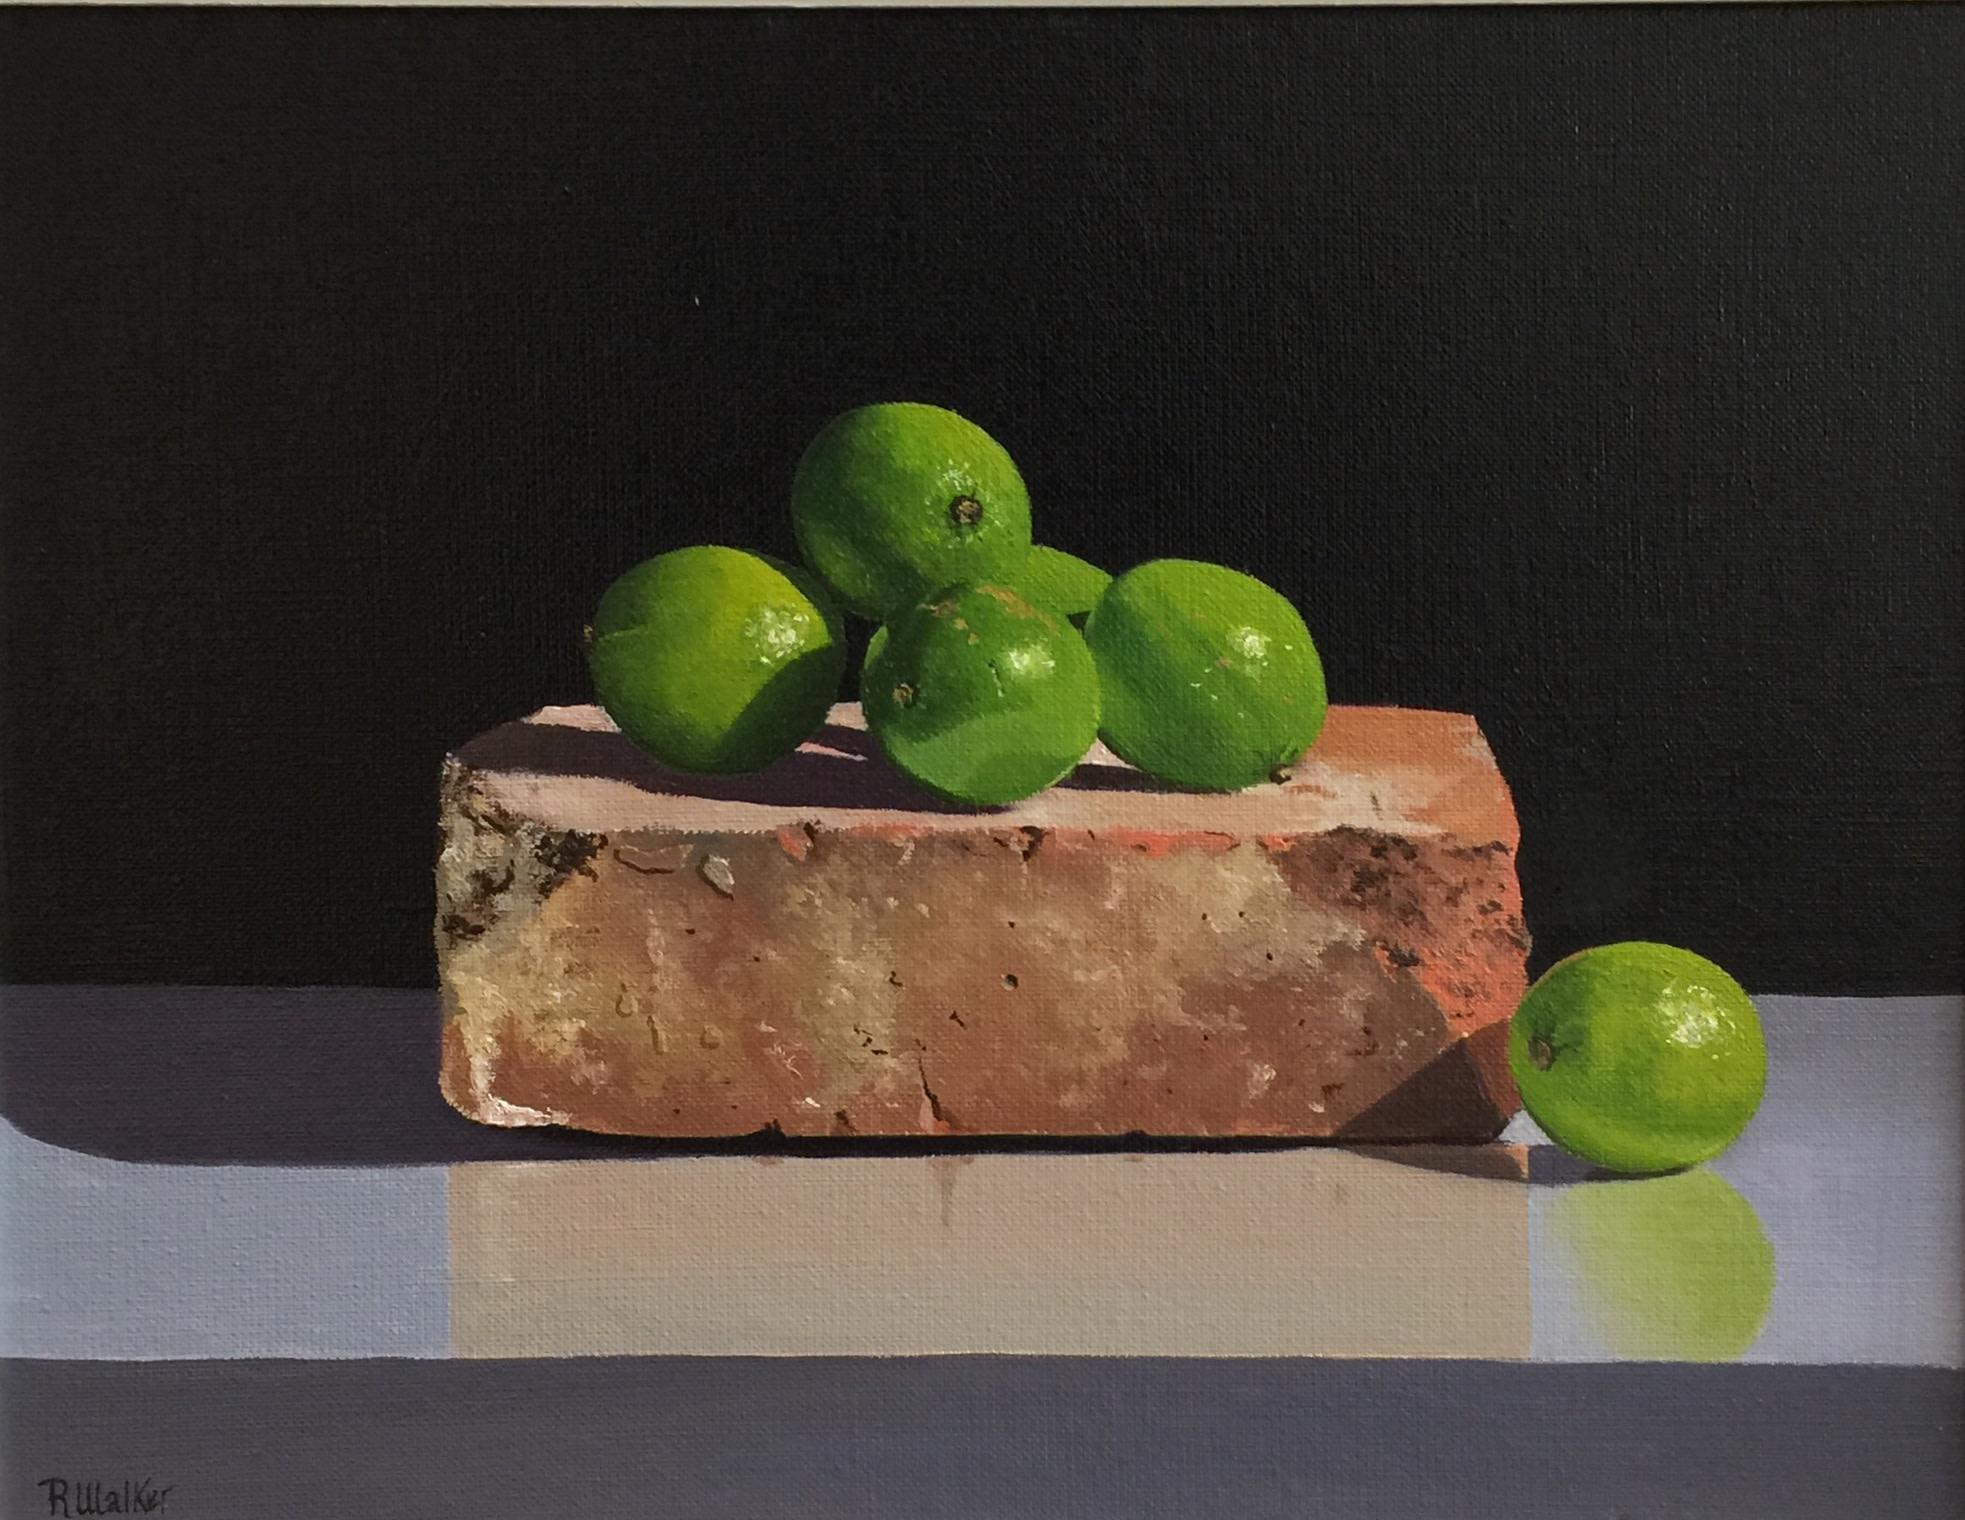 <span class=&#34;link fancybox-details-link&#34;><a href=&#34;/artists/67-robert-walker/works/2776-robert-walker-limes-and-brick/&#34;>View Detail Page</a></span><div class=&#34;artist&#34;><strong>Robert Walker</strong></div> <div class=&#34;title&#34;><em>Limes and Brick</em></div> <div class=&#34;medium&#34;>Oil on Canvas</div> <div class=&#34;dimensions&#34;>29 x 36 cm</div><div class=&#34;copyright_line&#34;>Copyright The Artist</div>